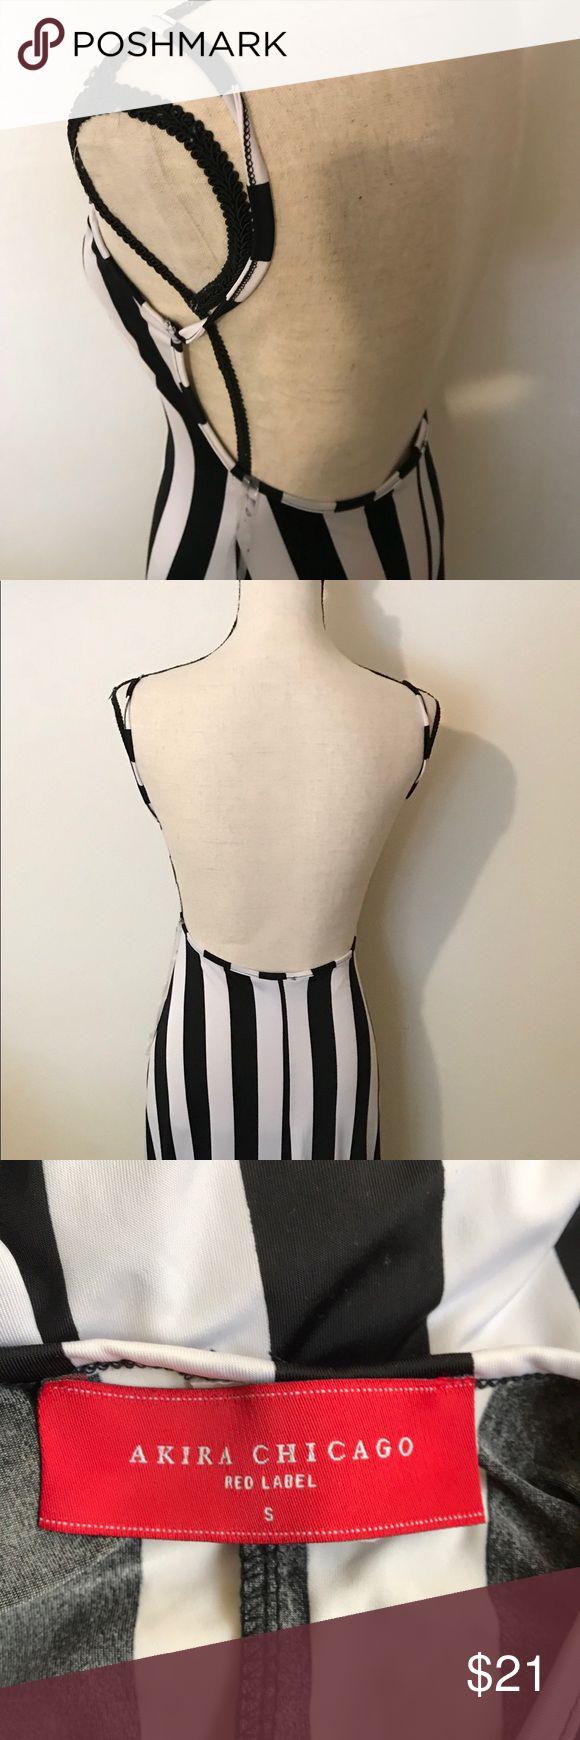 "Akira Chicago red label stripe long dress Black and white stripes ,Backless dress, see through,length 52"",chest 13"" akira Dresses Maxi"